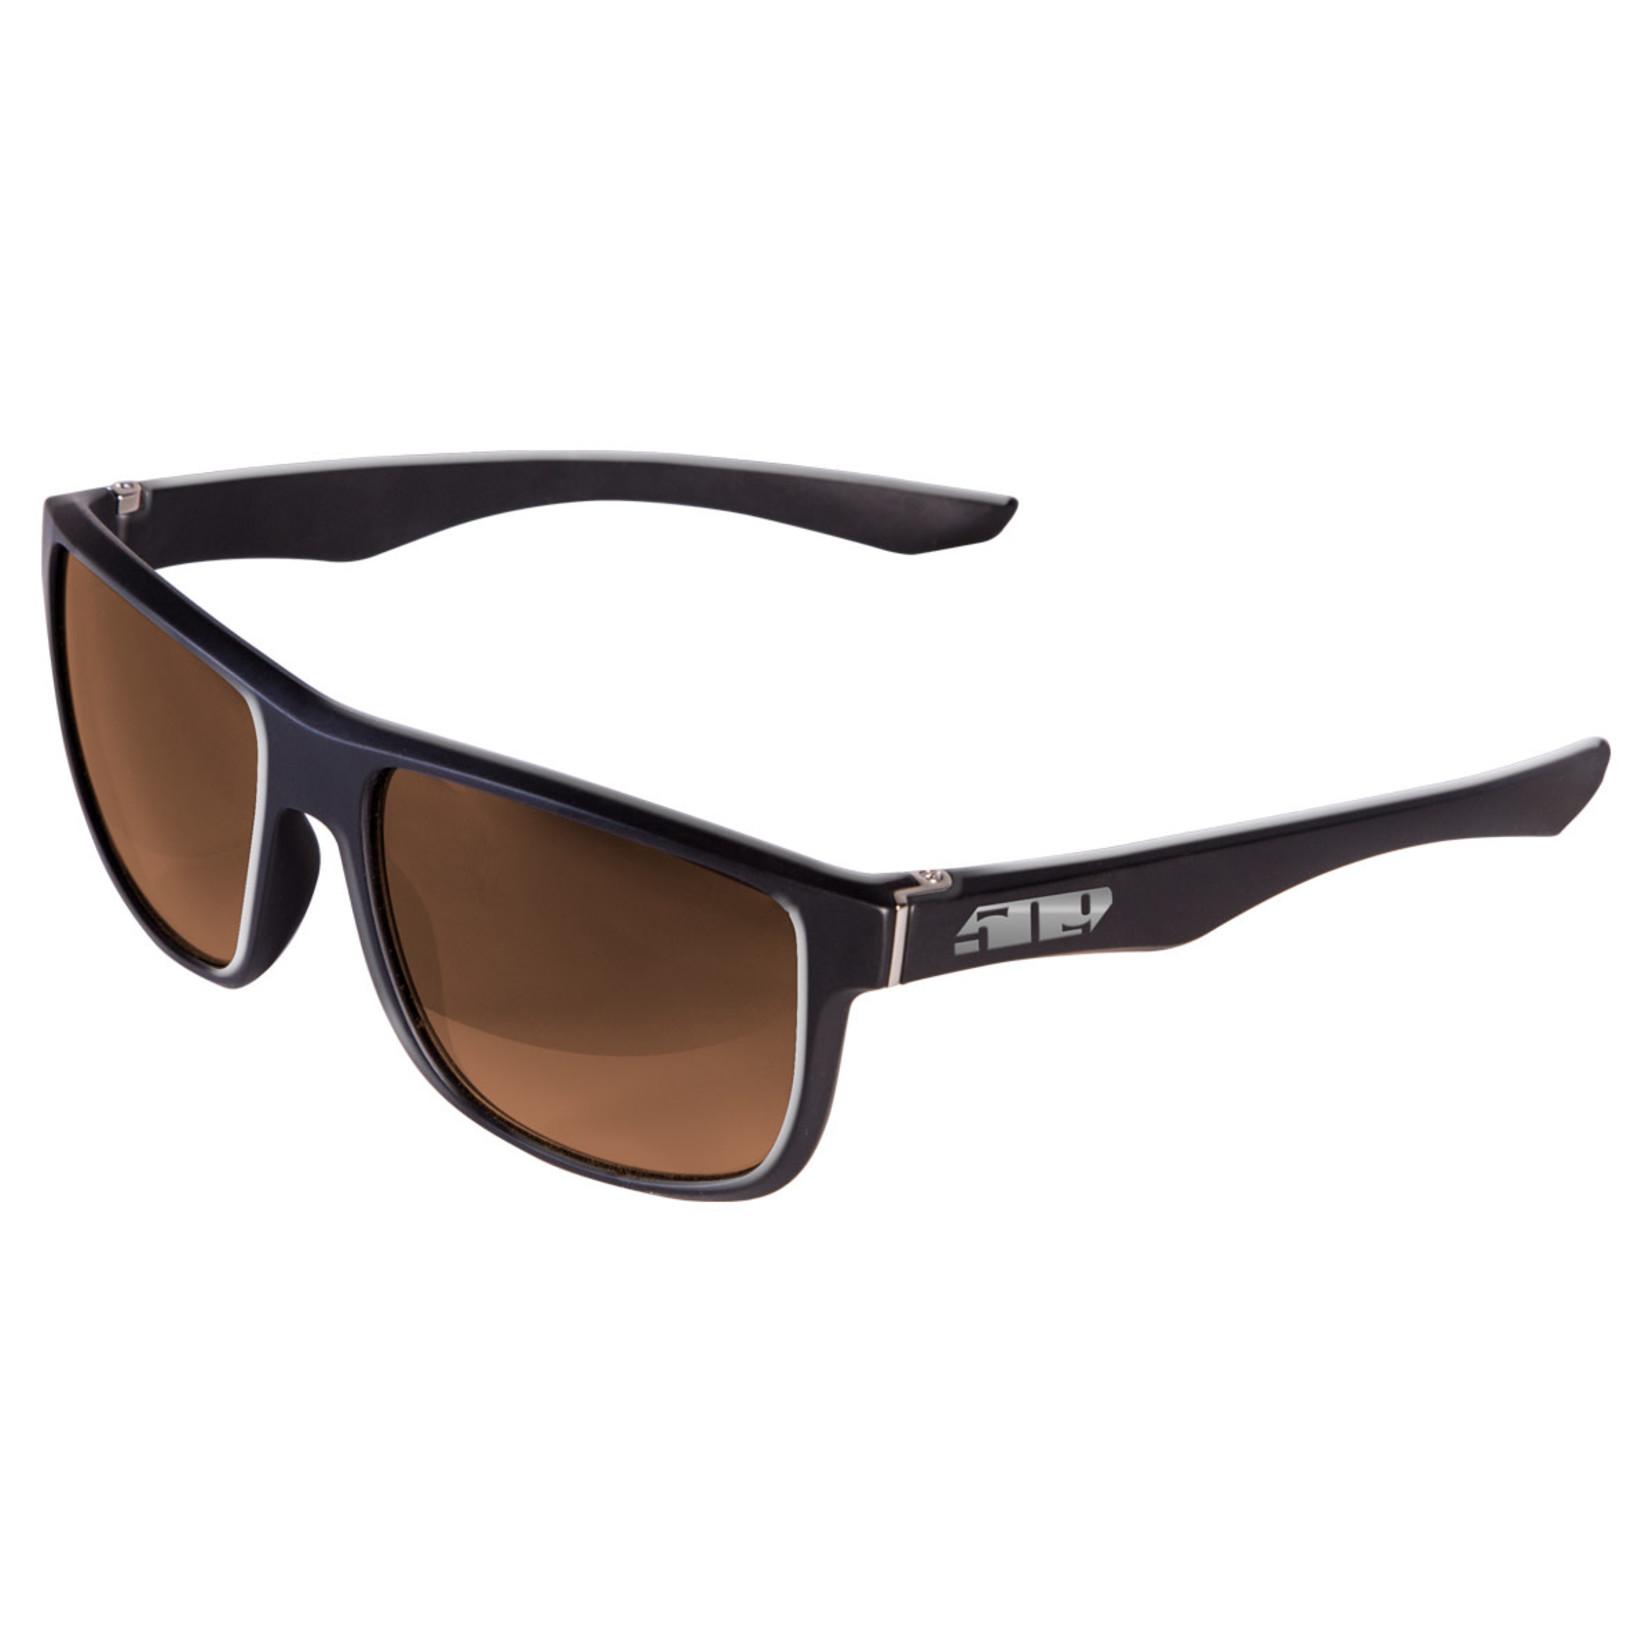 509 Riverside Sunglasses - Gloss Black (Polarized Bronze Mirror)